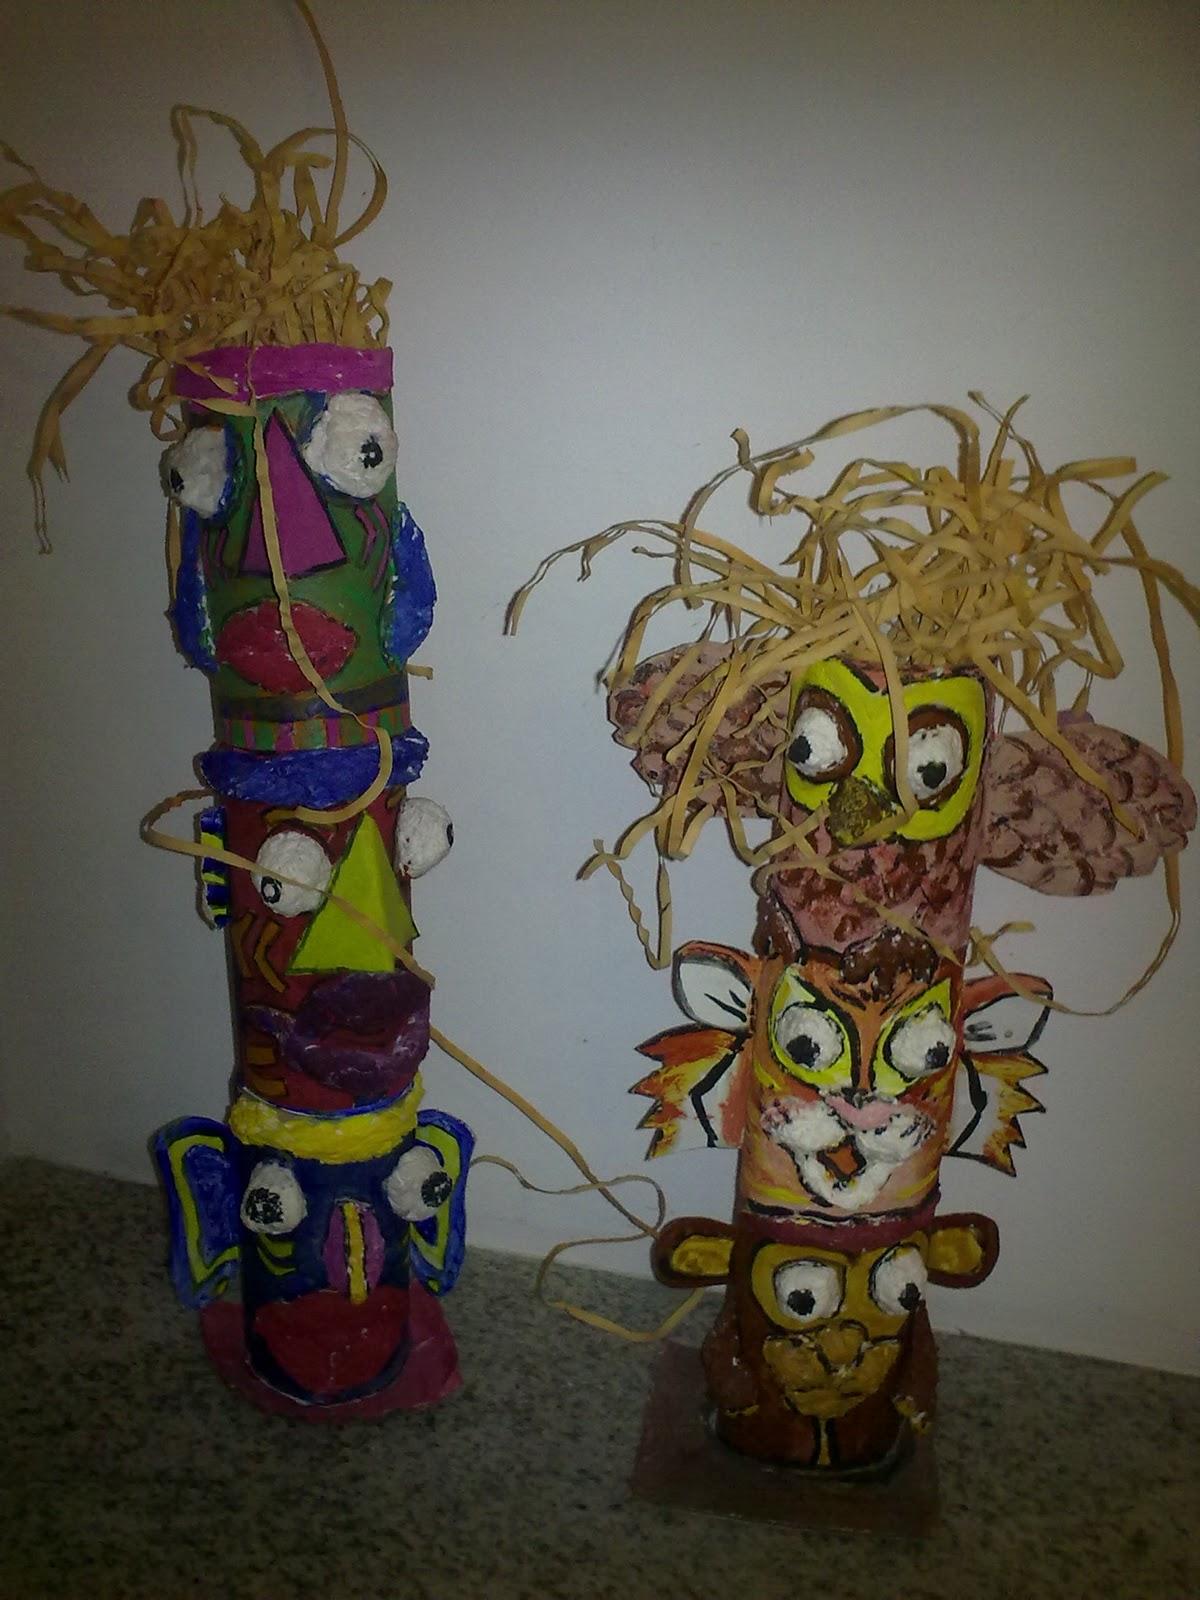 Cantinho da arte мистецький куточок